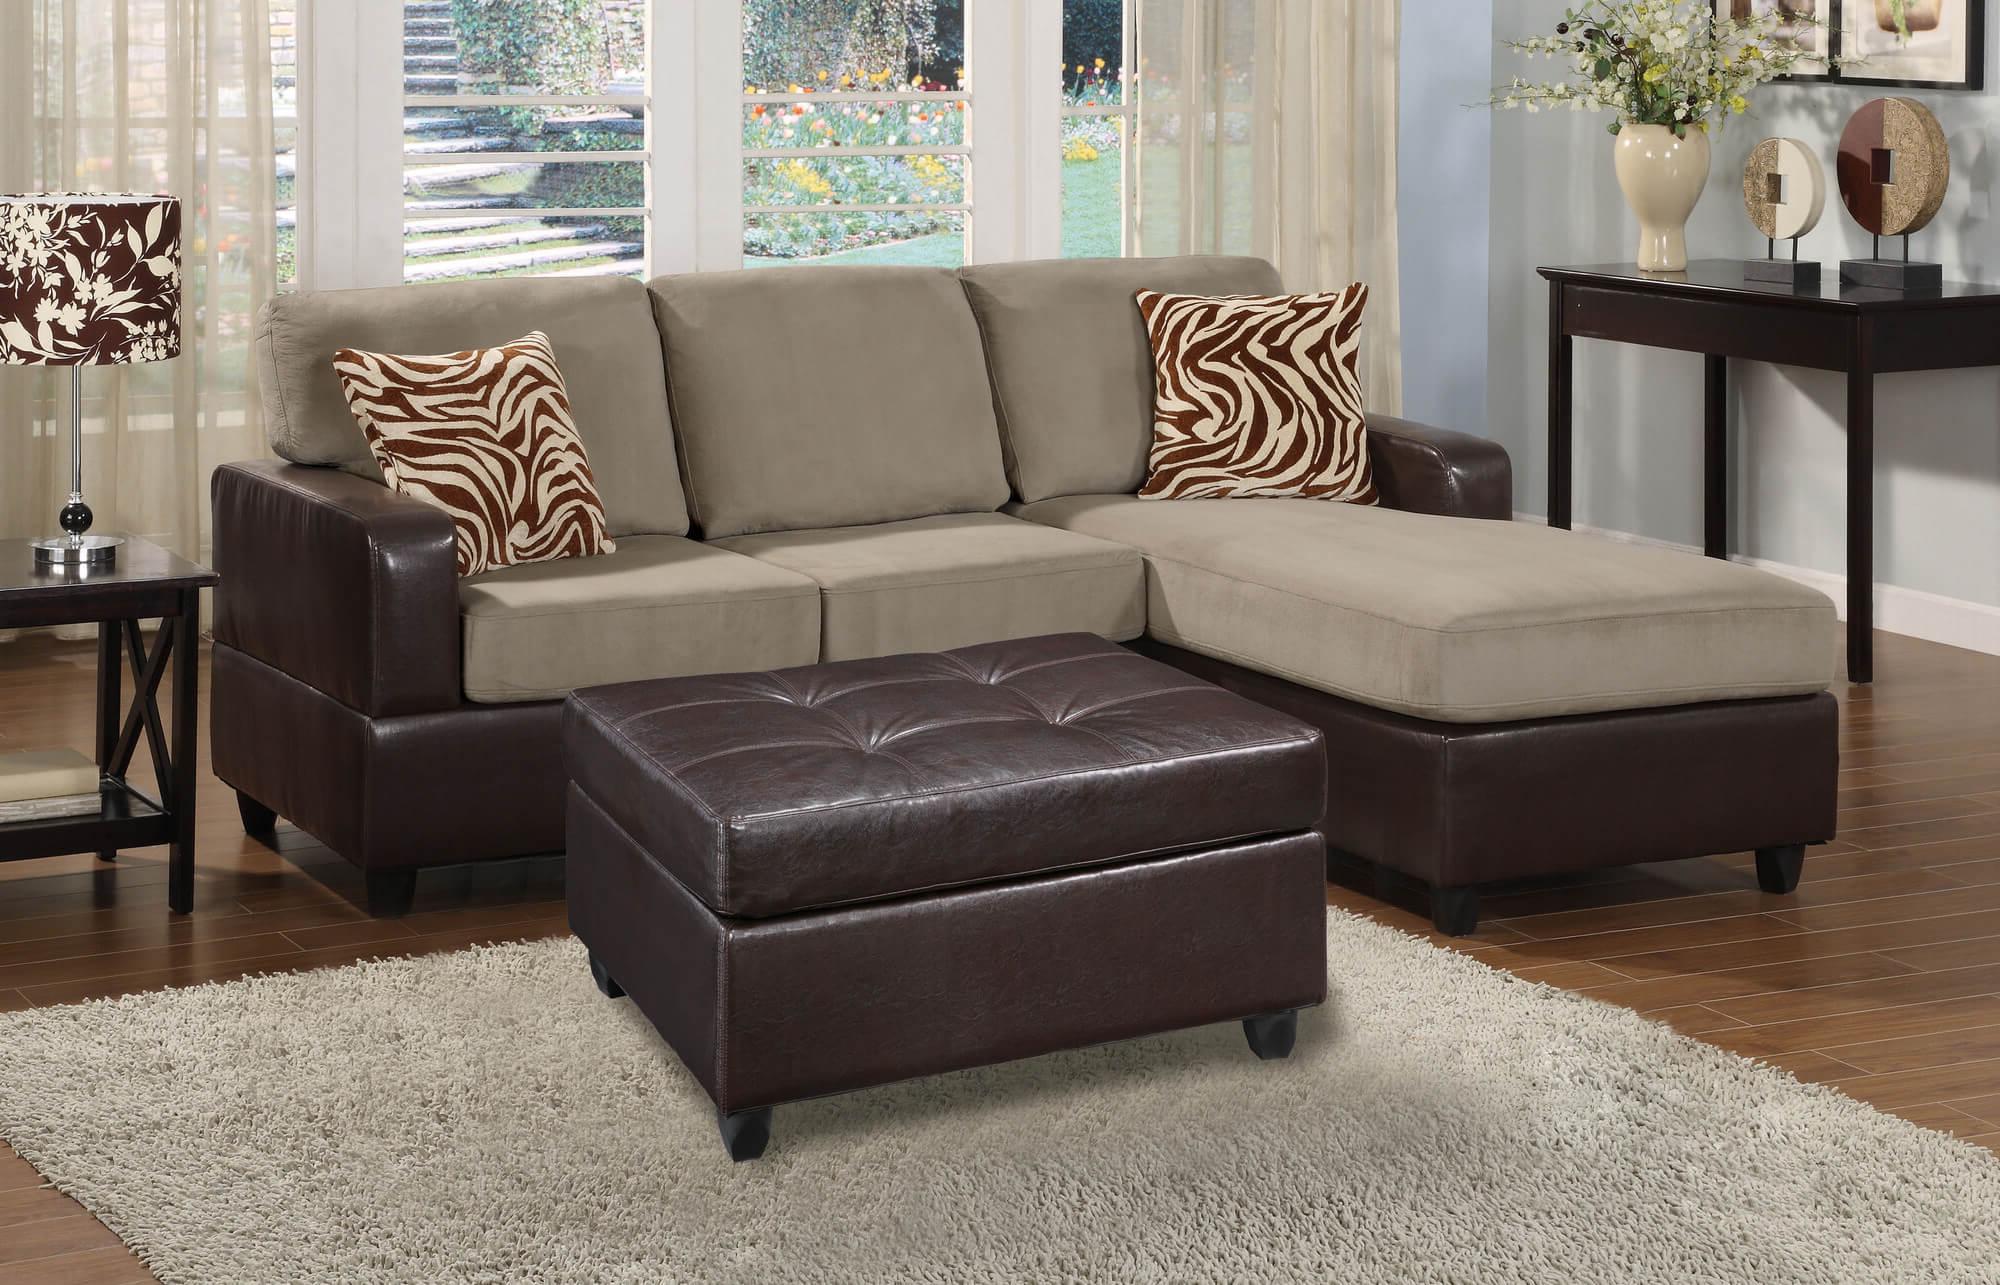 Egan Sofa W Reversible Chaise (View 11 of 20)